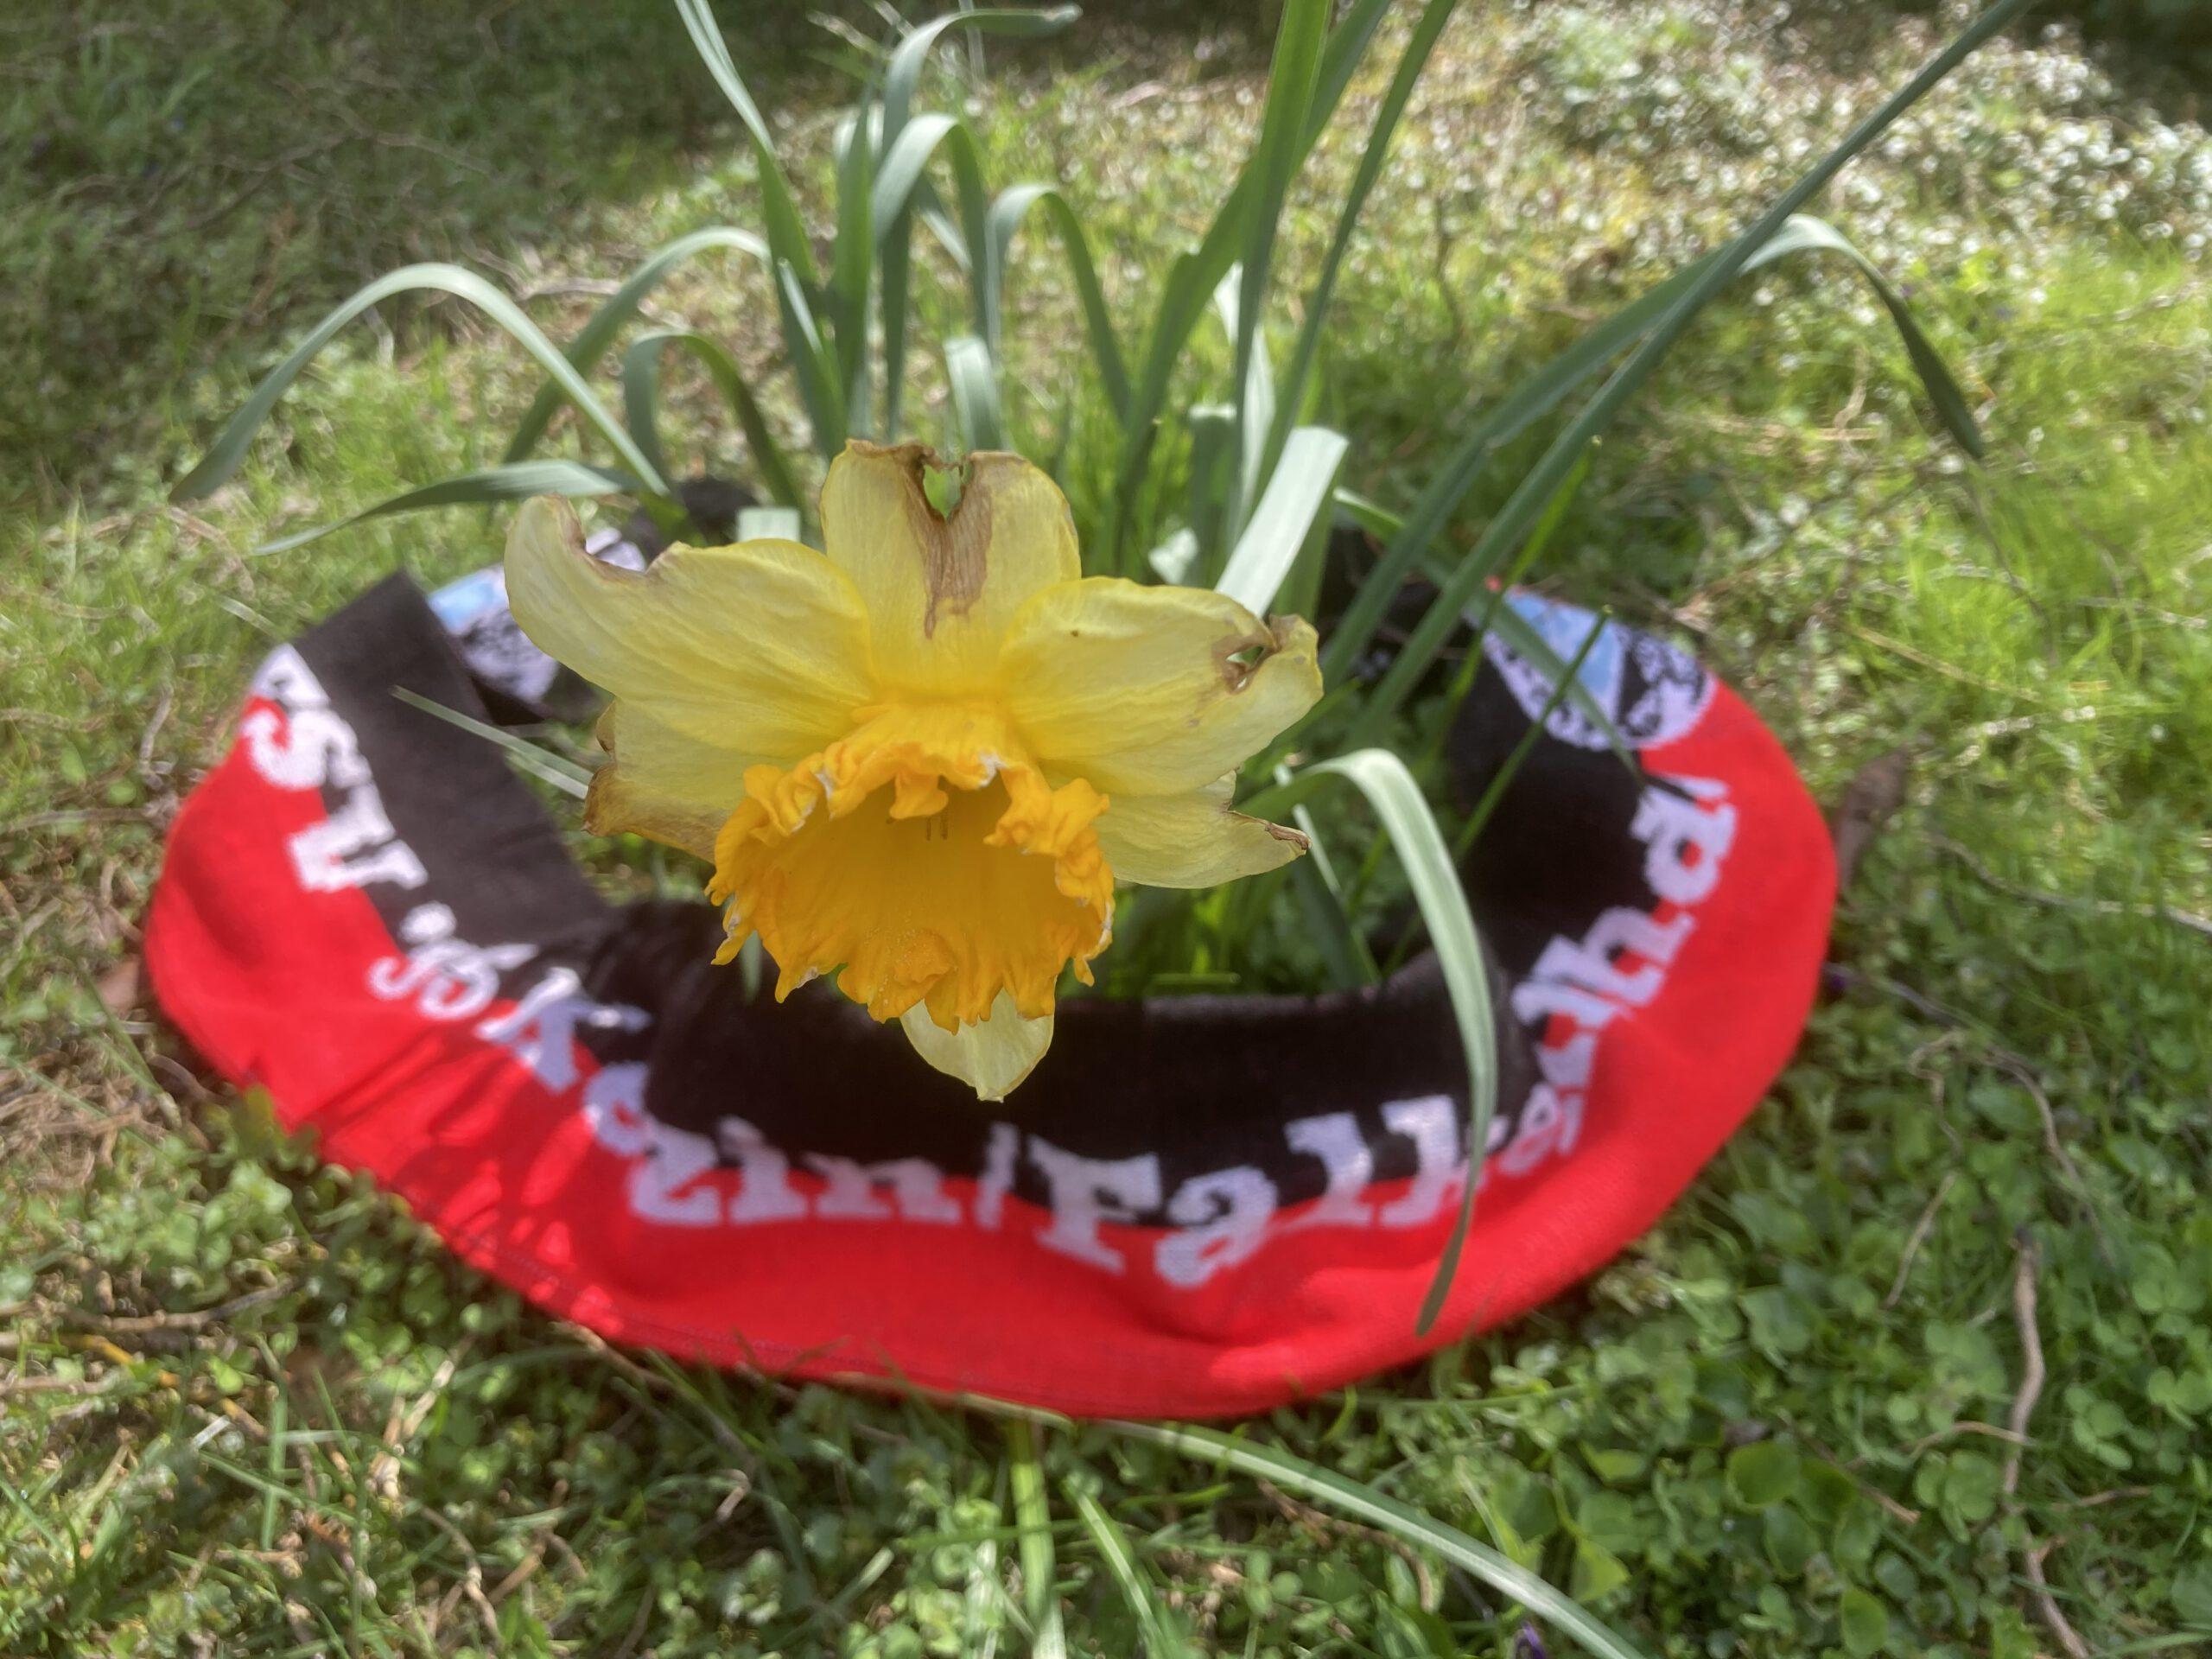 Zarte Frühlingsblüten: Kindertraining bald wieder möglich